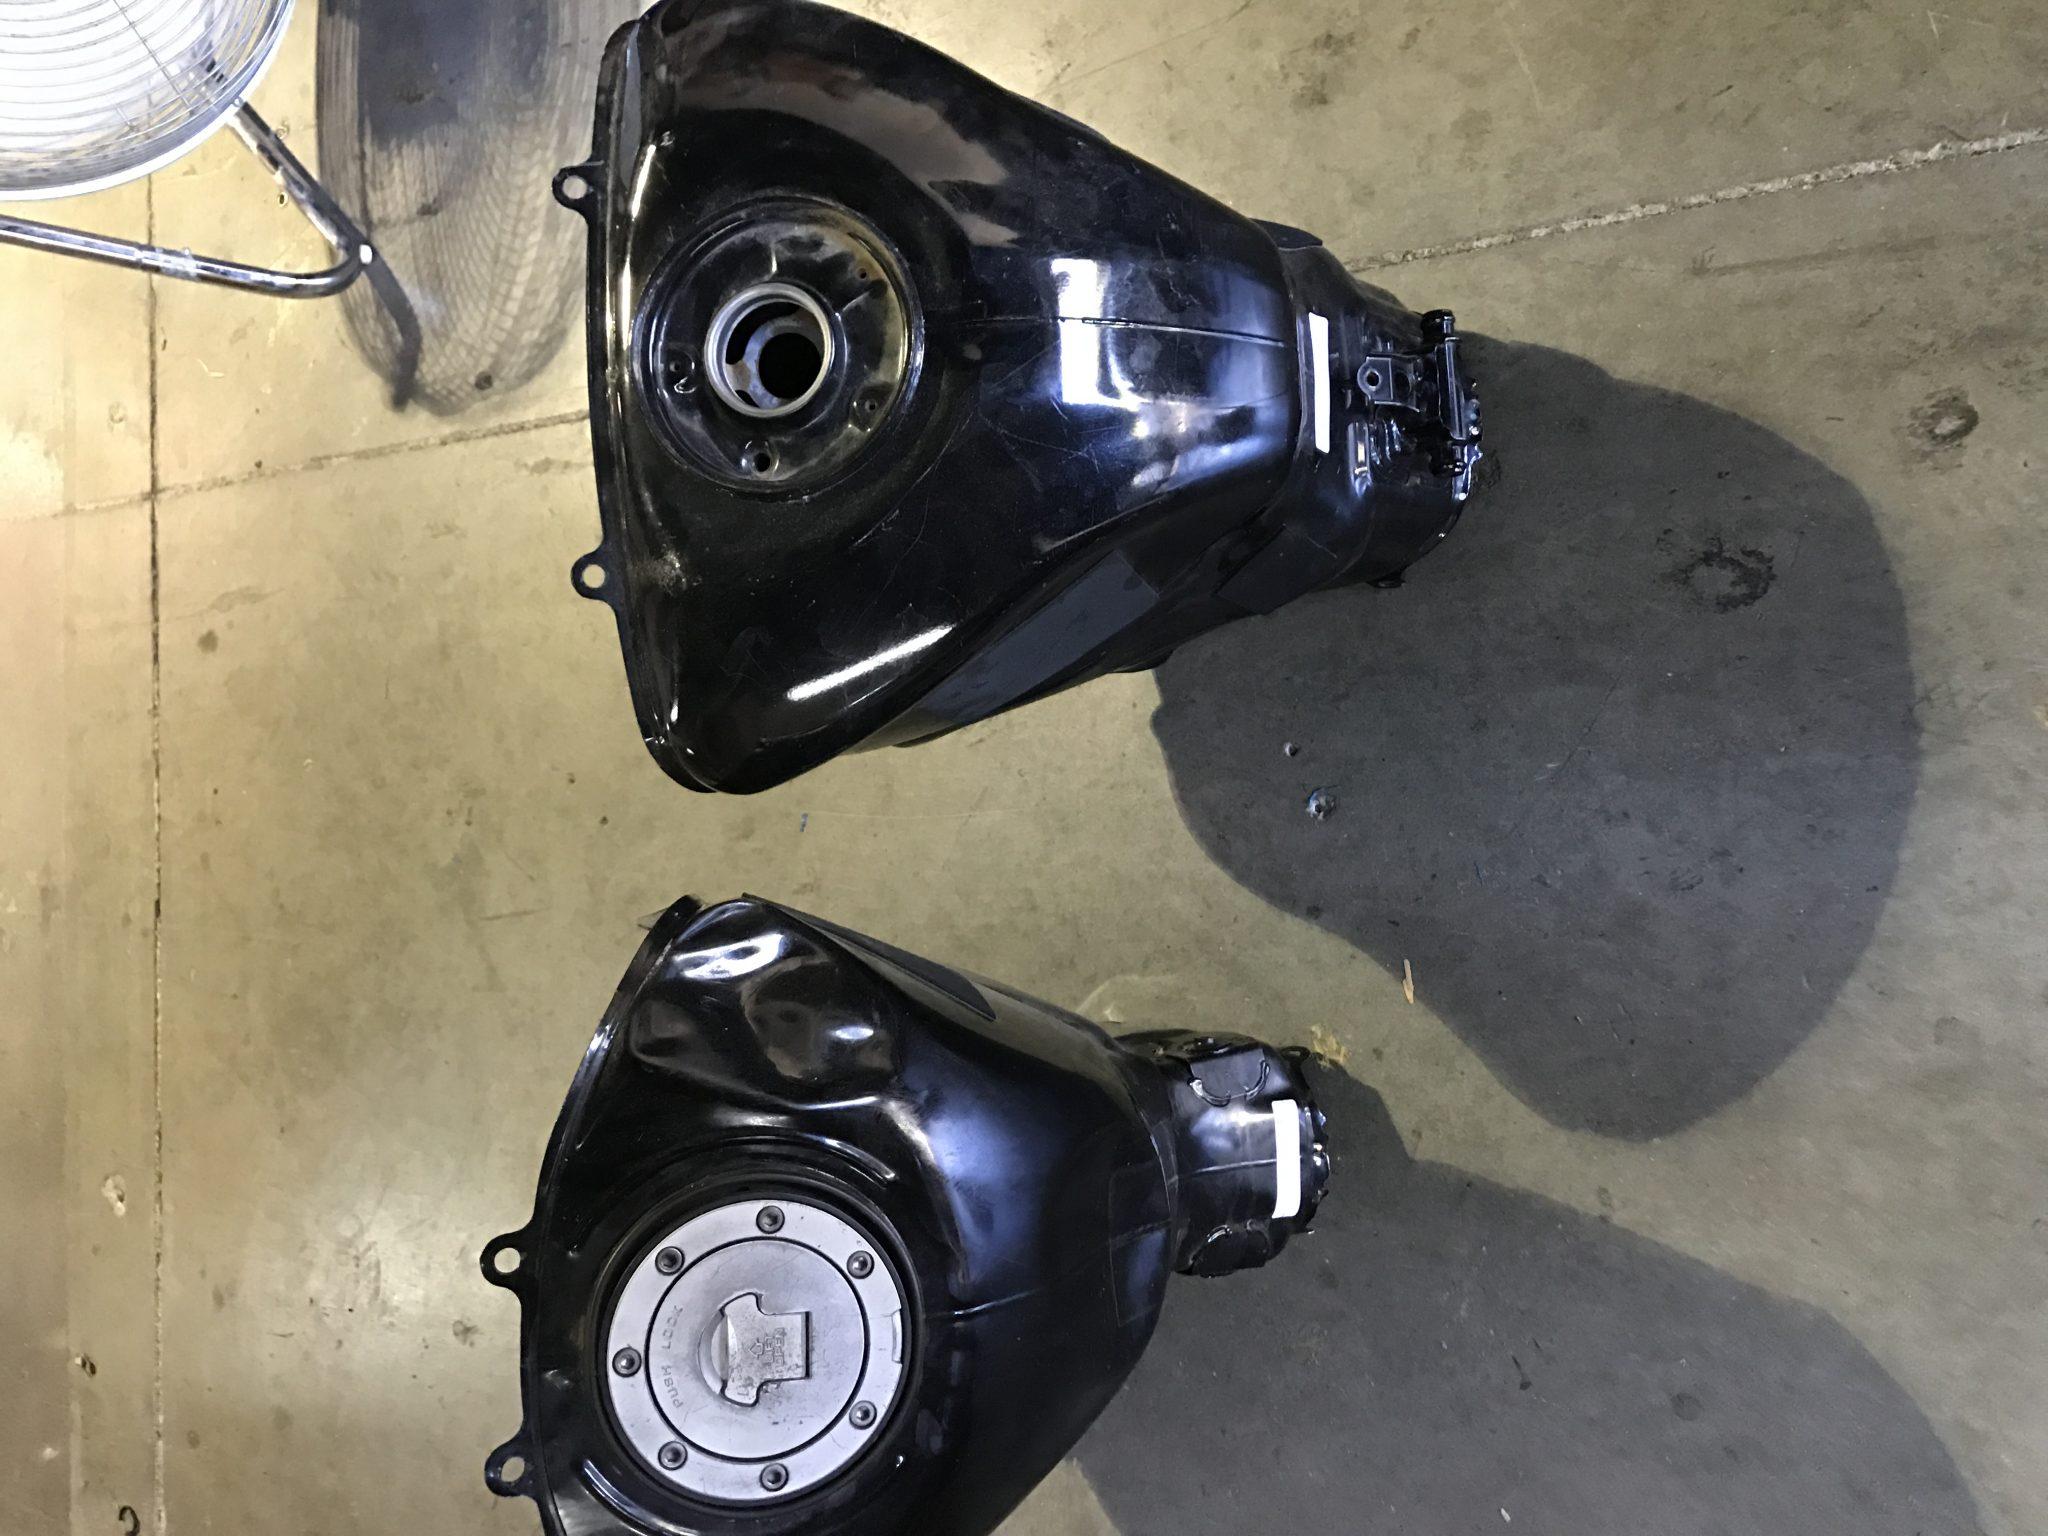 » 03-09 Honda CBR 600/1000 gas tanksParts Thief